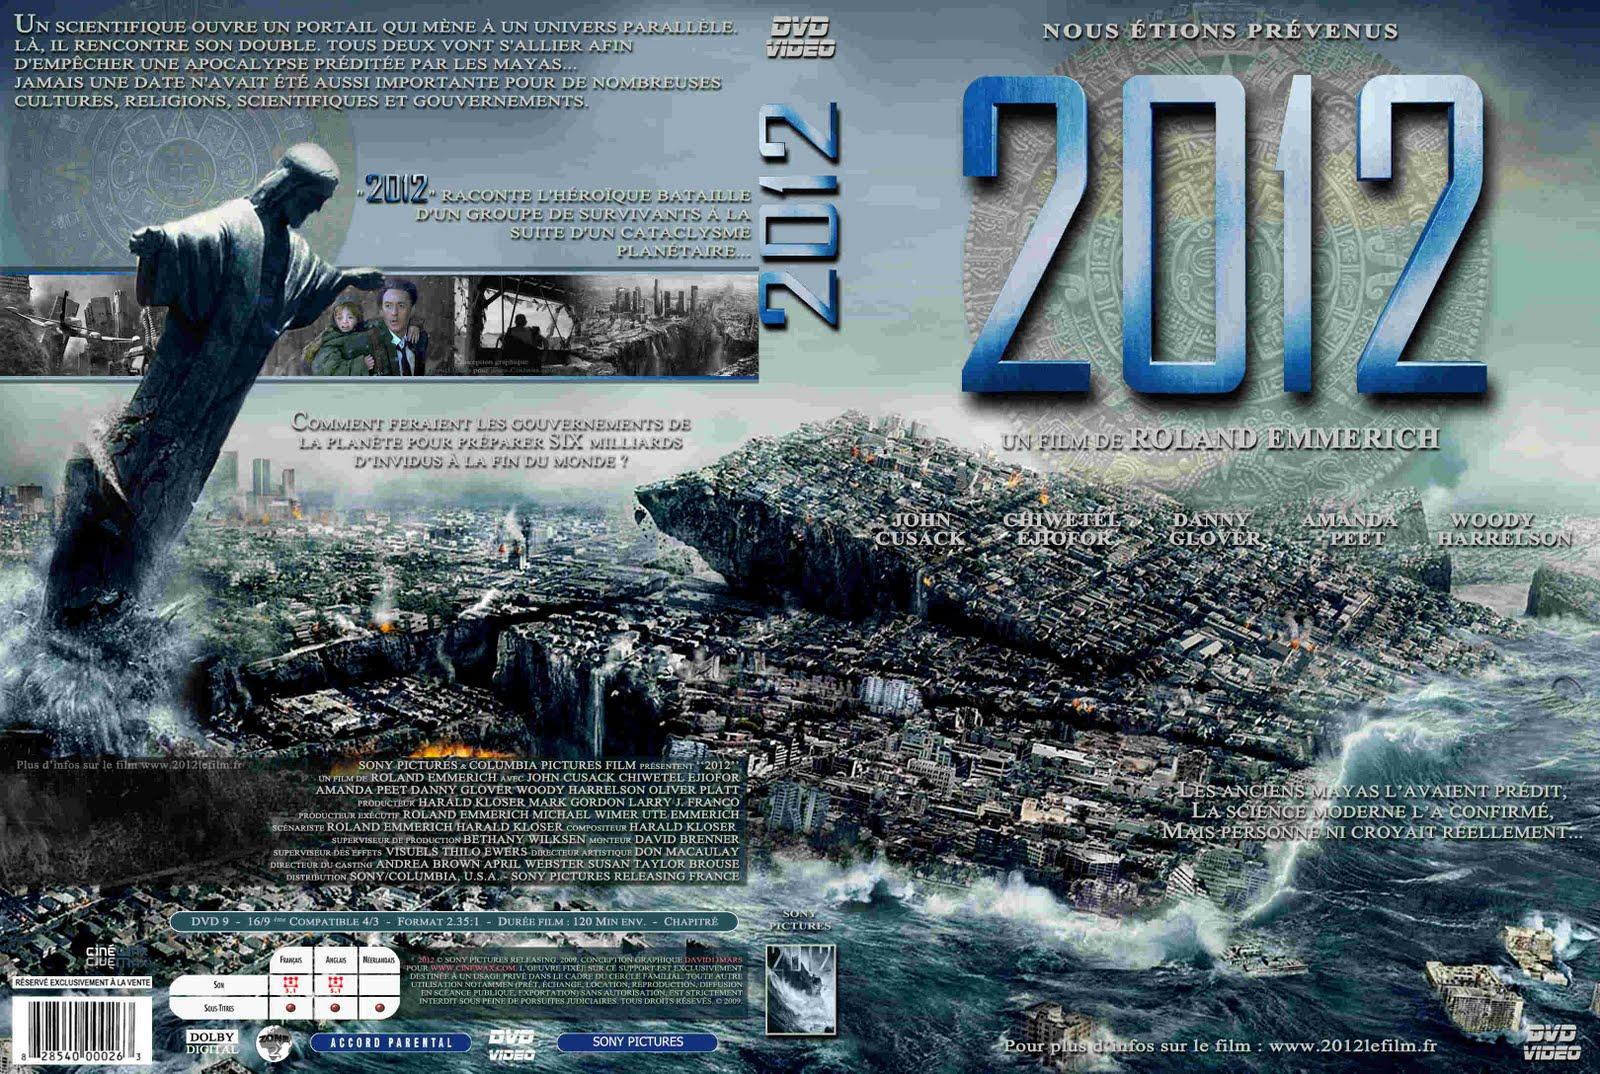 2012 movie cover - photo #10